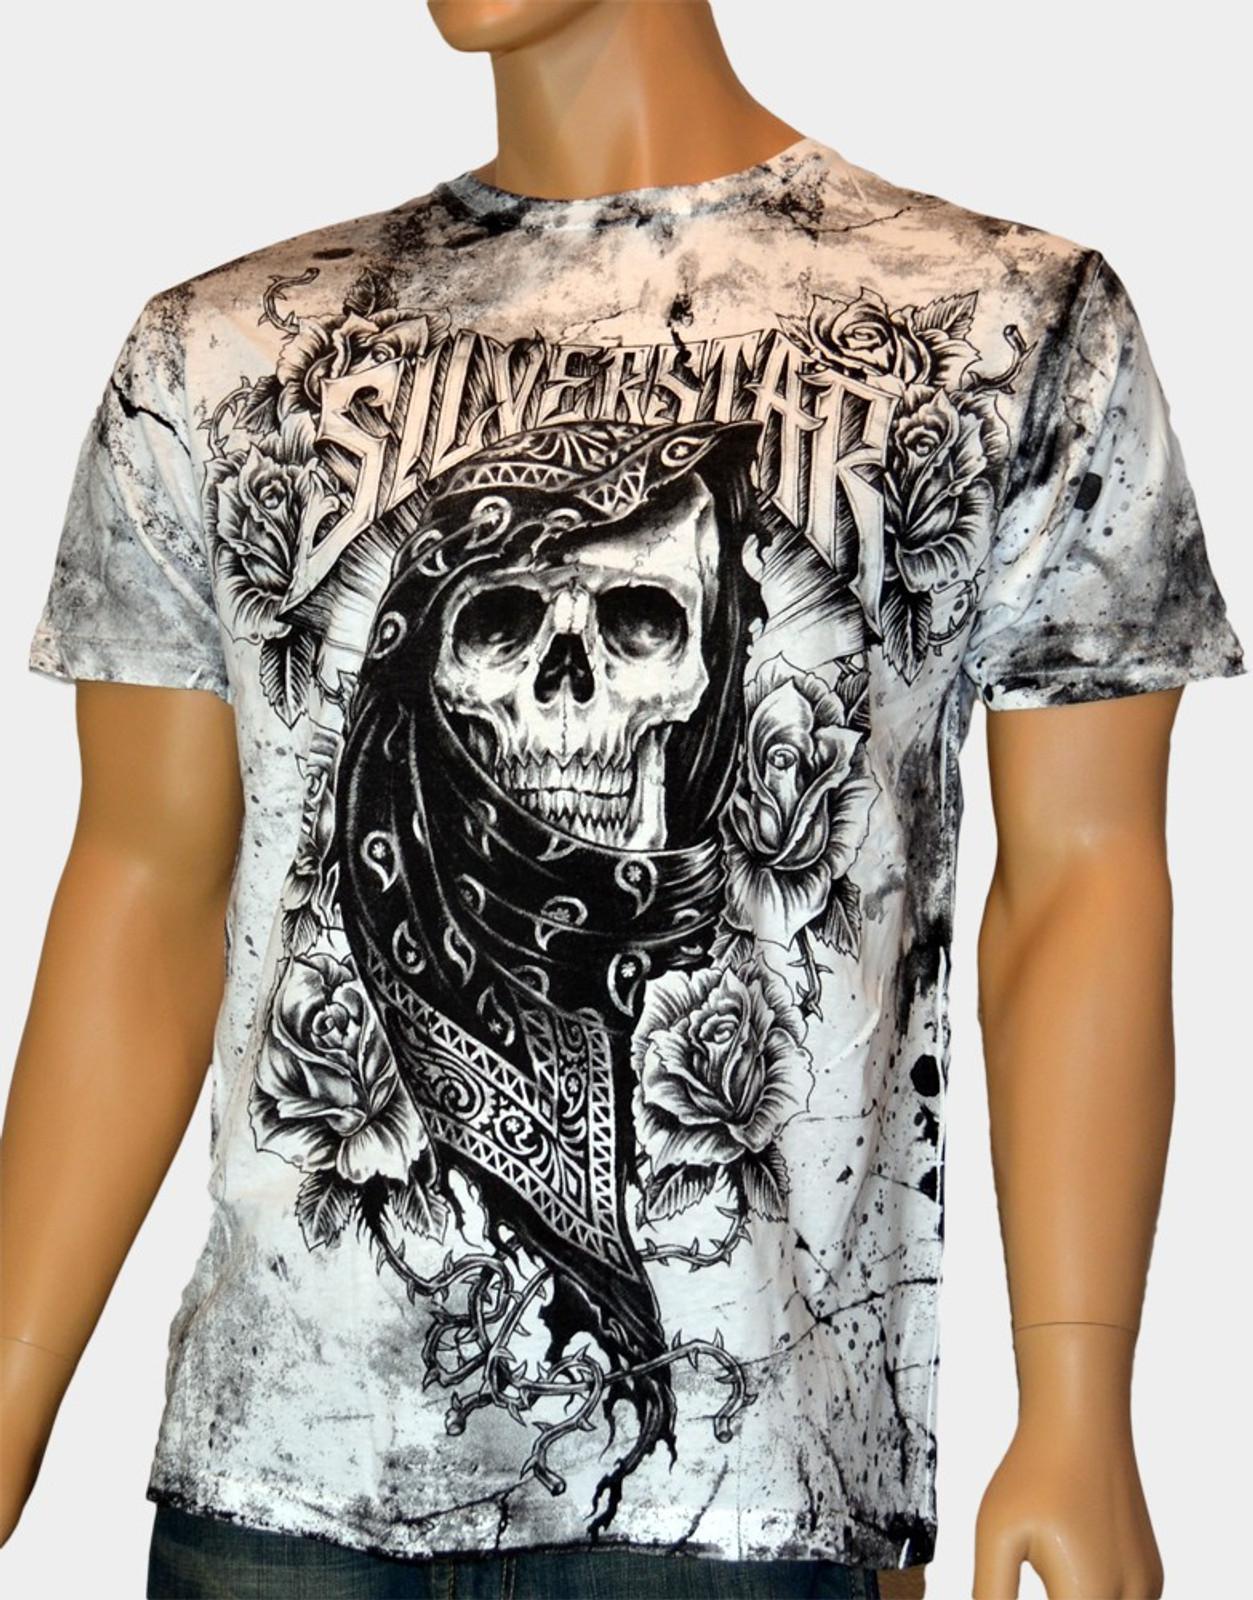 Silver Star T-Shirt Keffiyeh